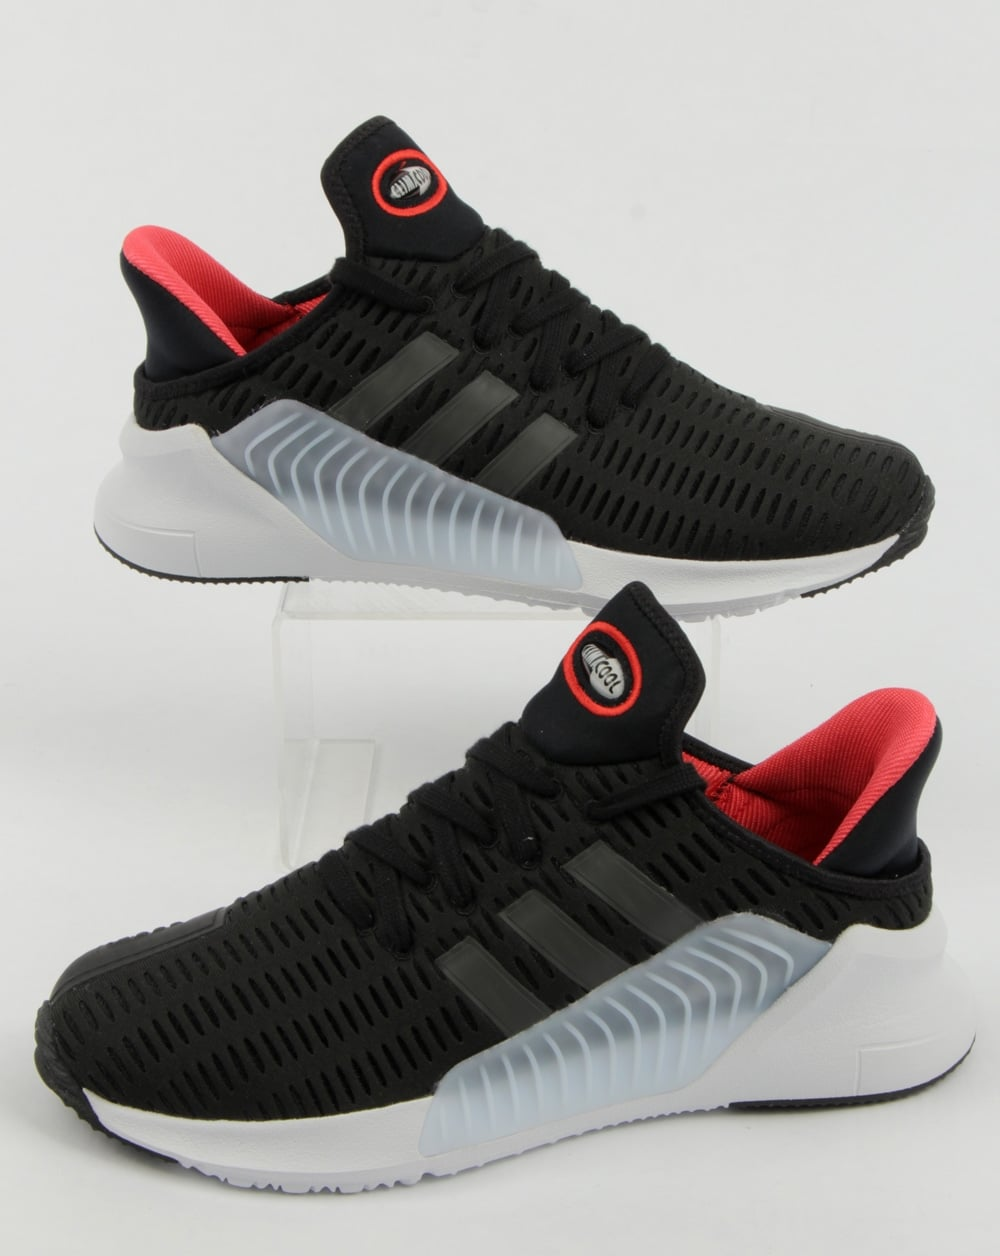 7391a7615b4b8 adidas Trainers Adidas Climacool 02 17 Trainers Black white